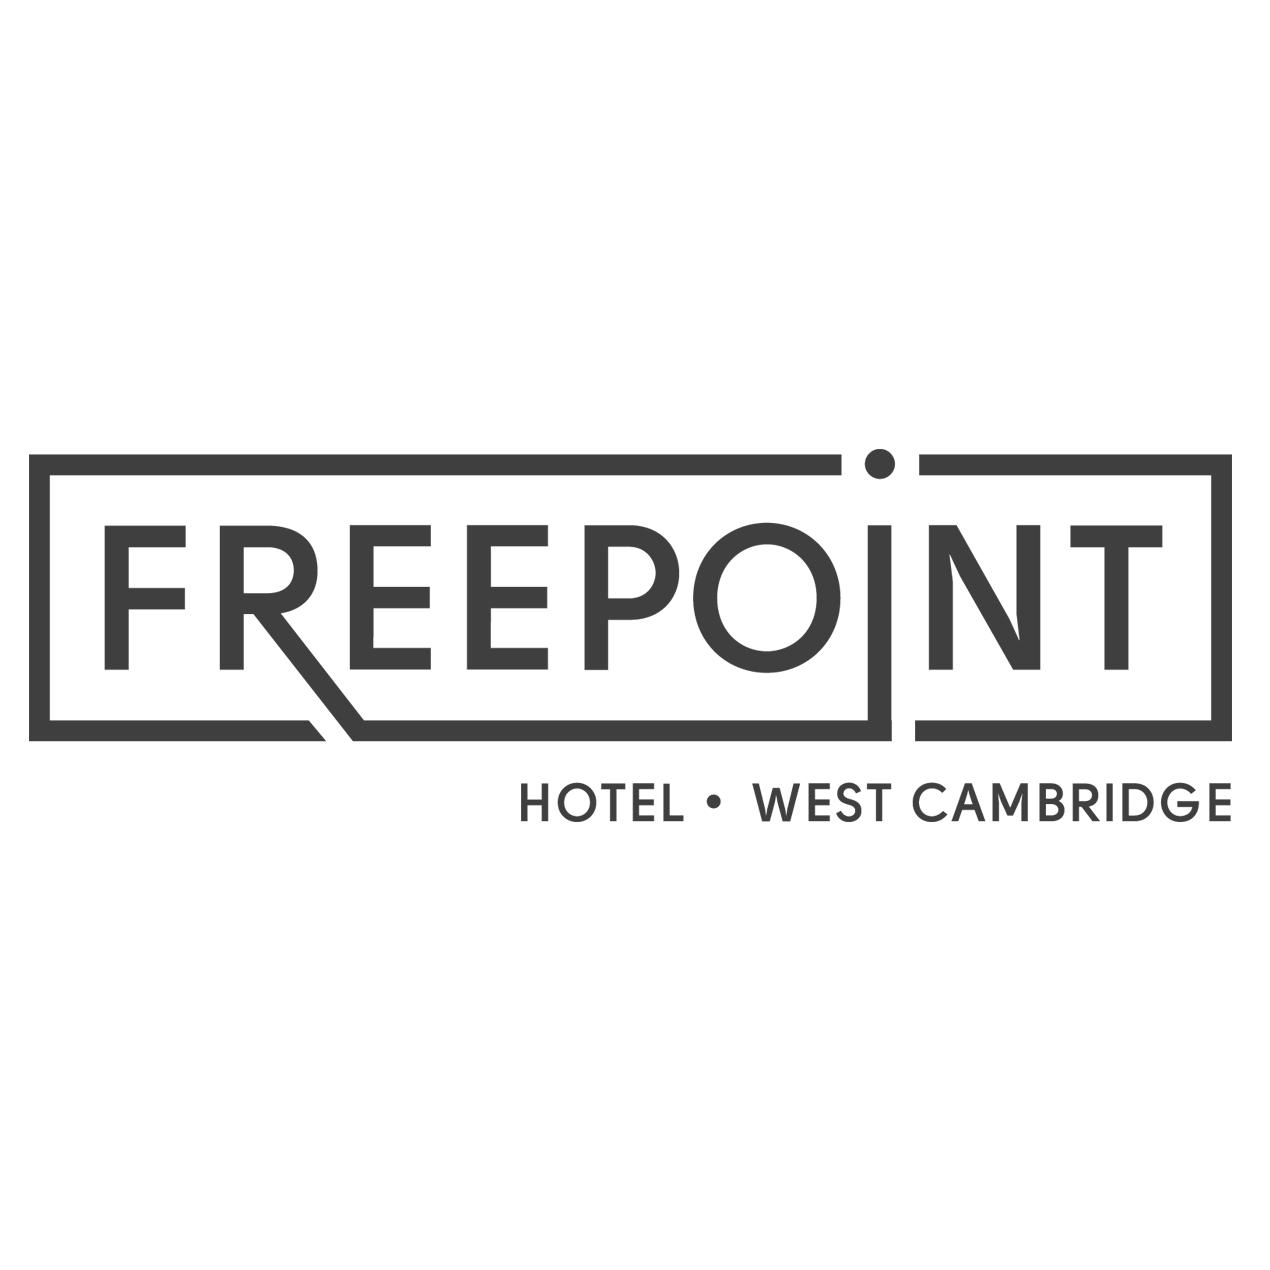 Freepoint Hotel West Cambridge